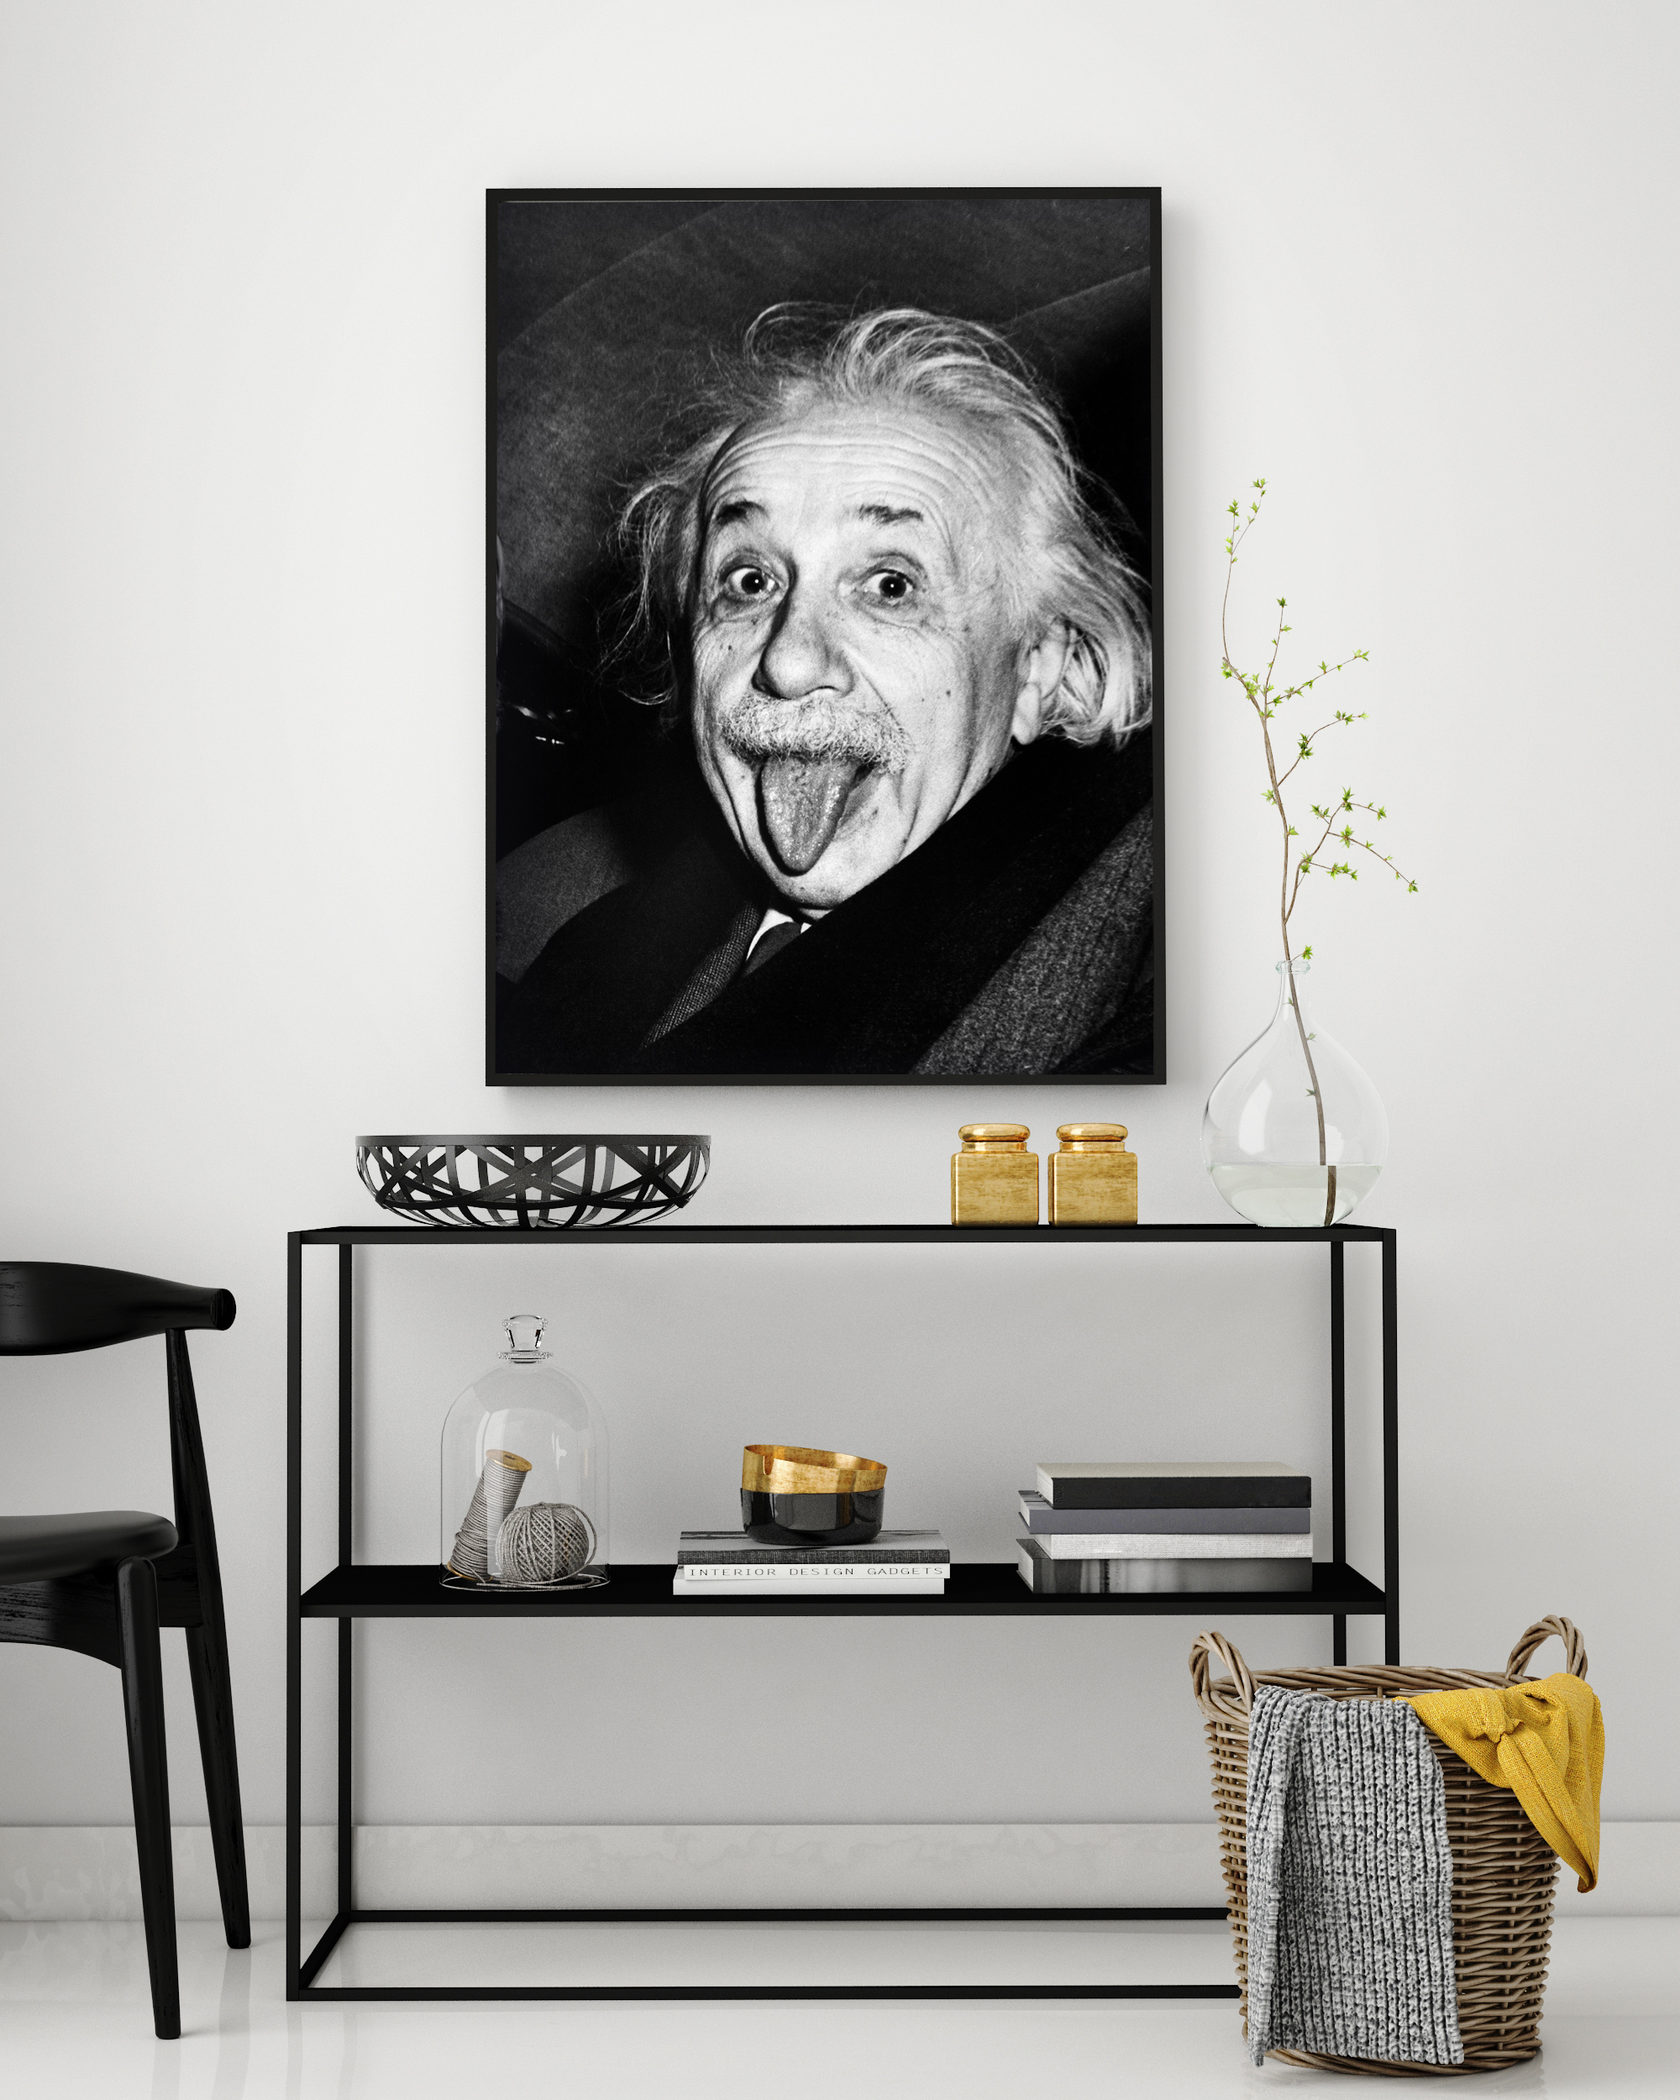 знаю, эйнштейн альберт постер всегда